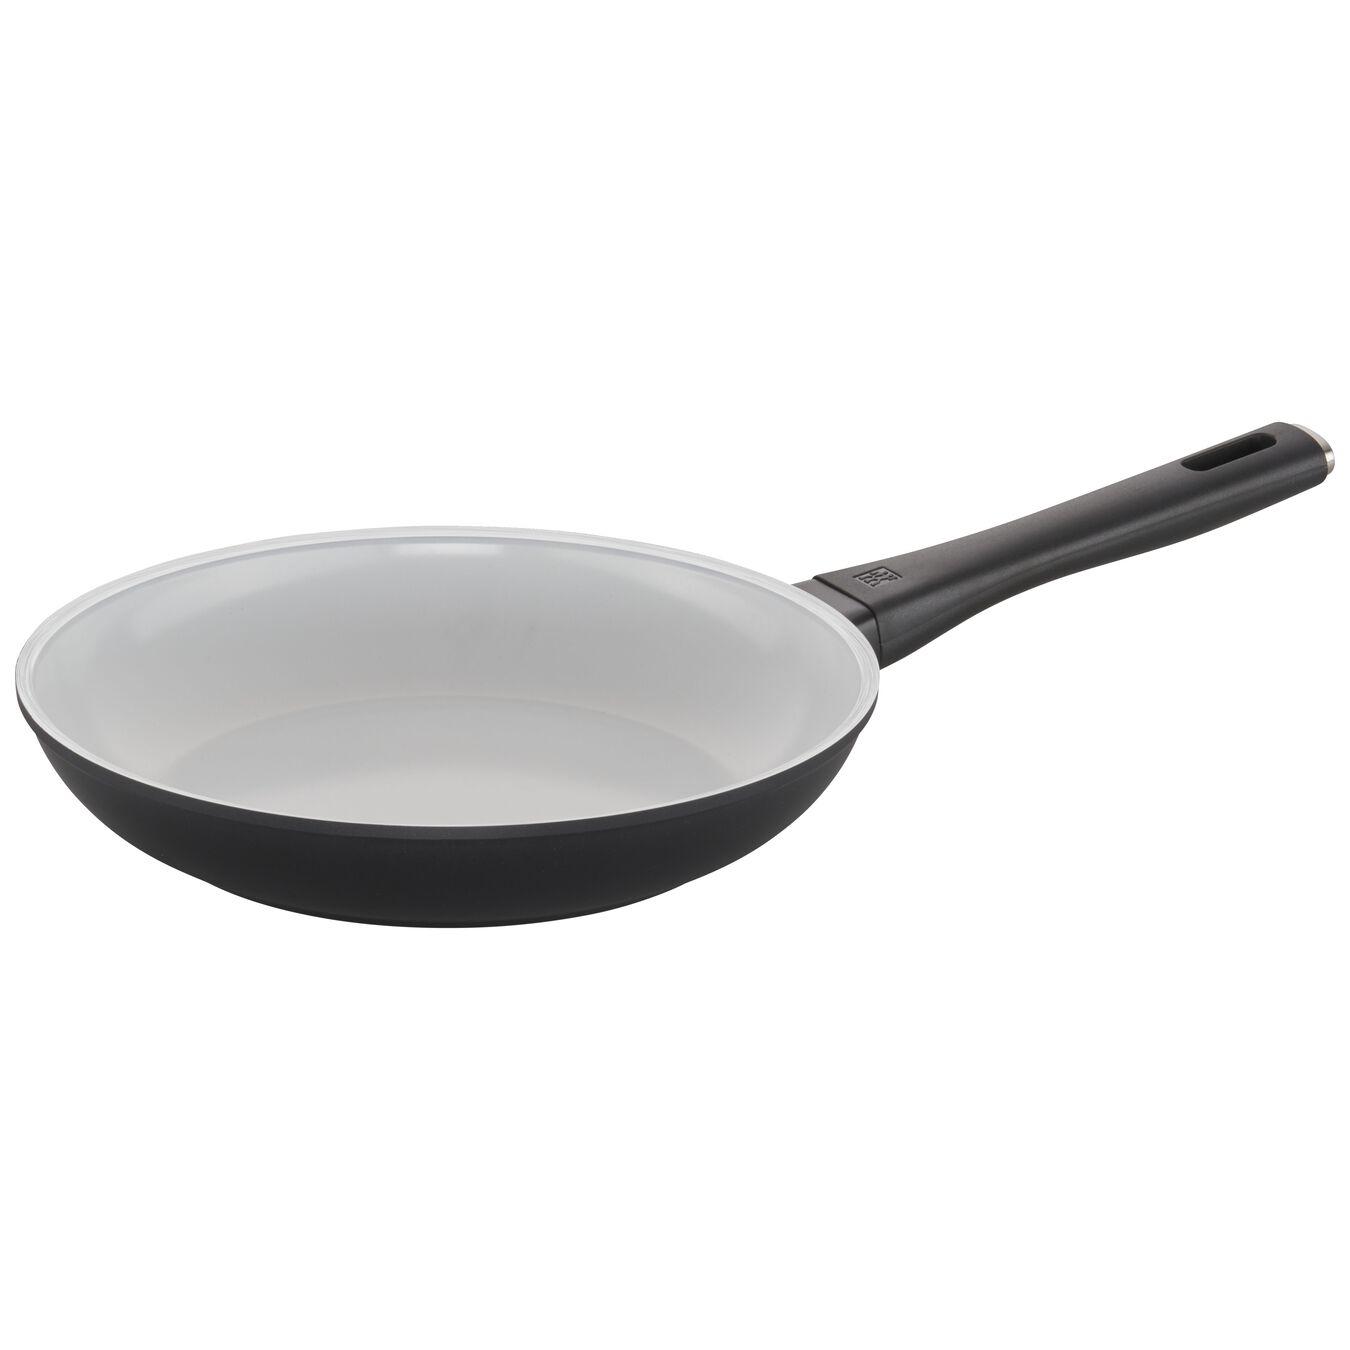 "10"" Aluminum Fry Pan Ceramic Nonstick,,large 2"